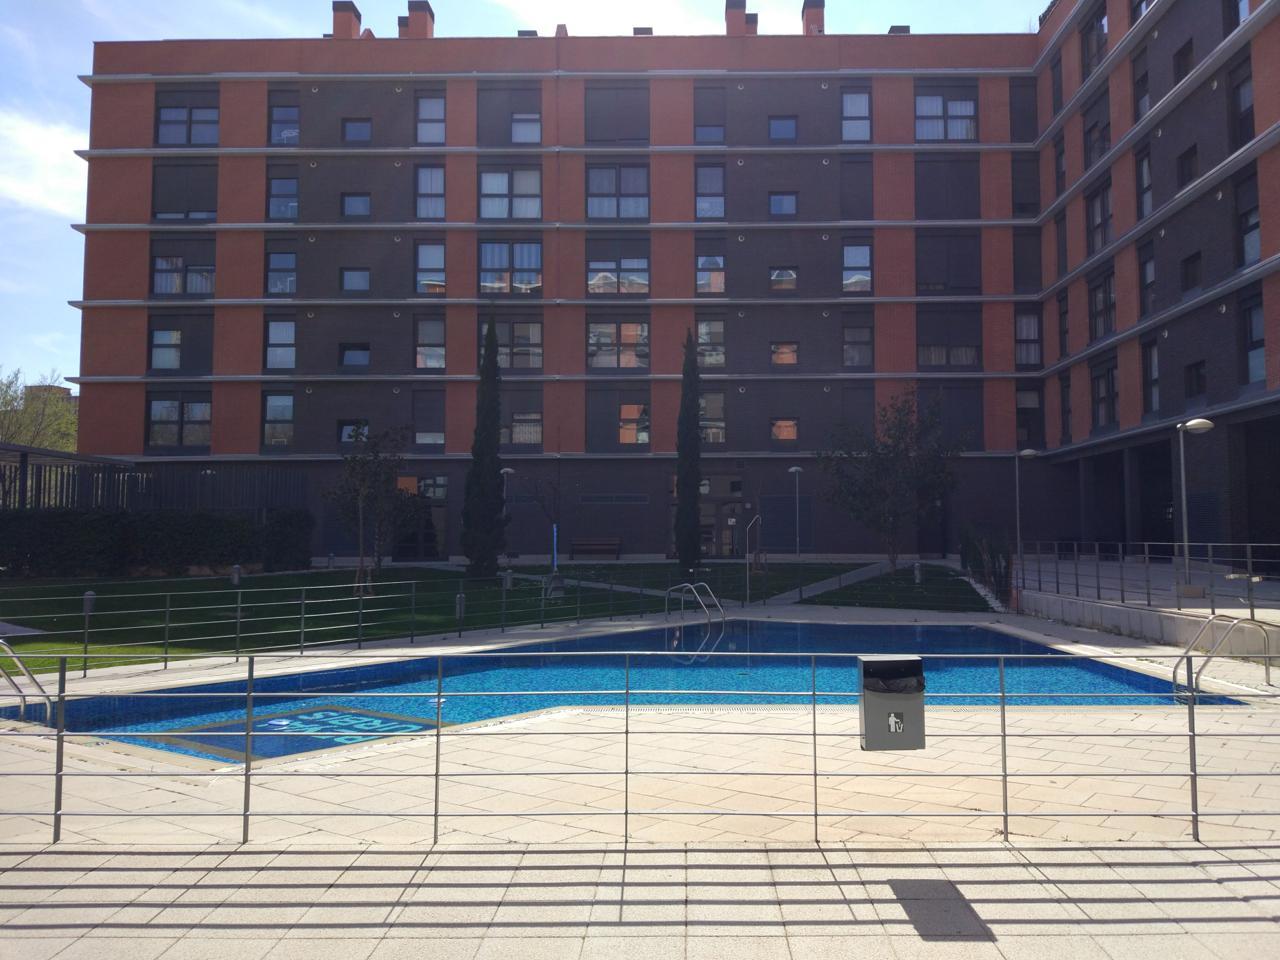 piso inversores con inquilino obra nueva zaragoza|publipisos inmobiliarias-1